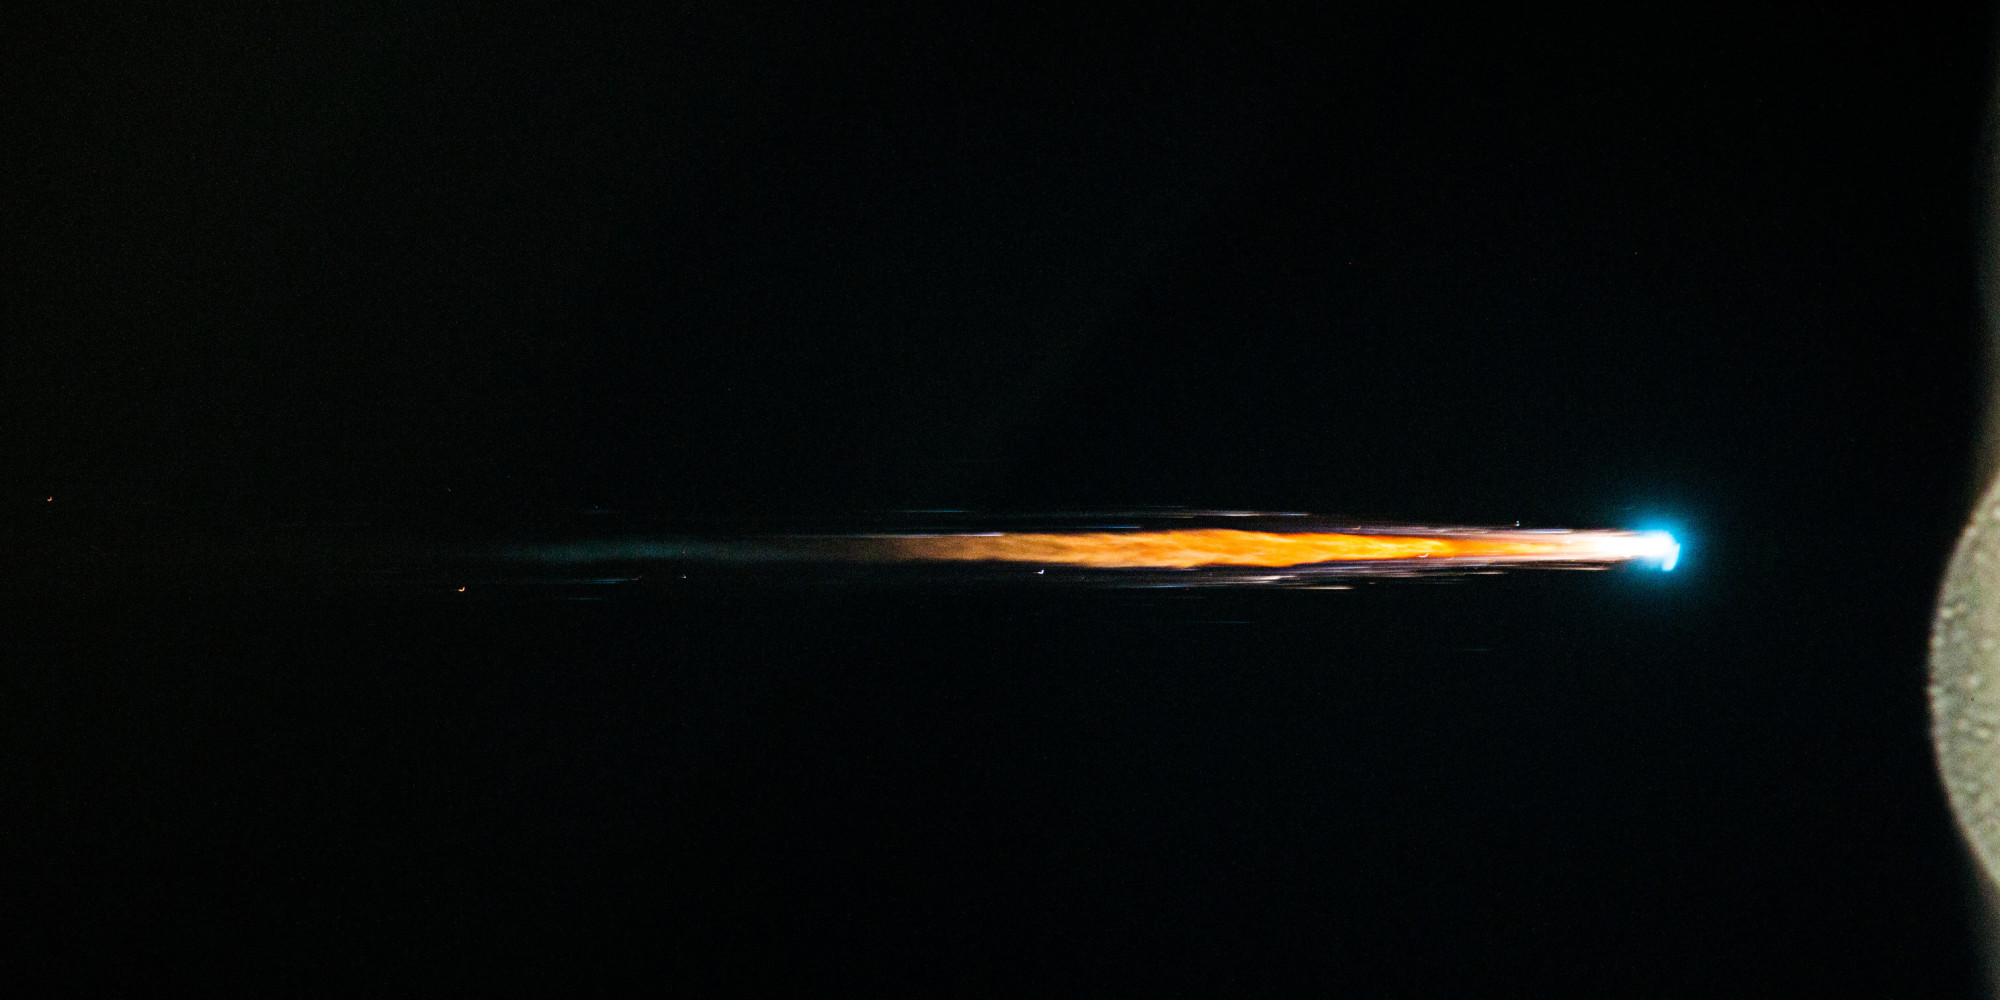 Astronauts Watch Spacecraft Burn Up In Earth's Atmosphere ...